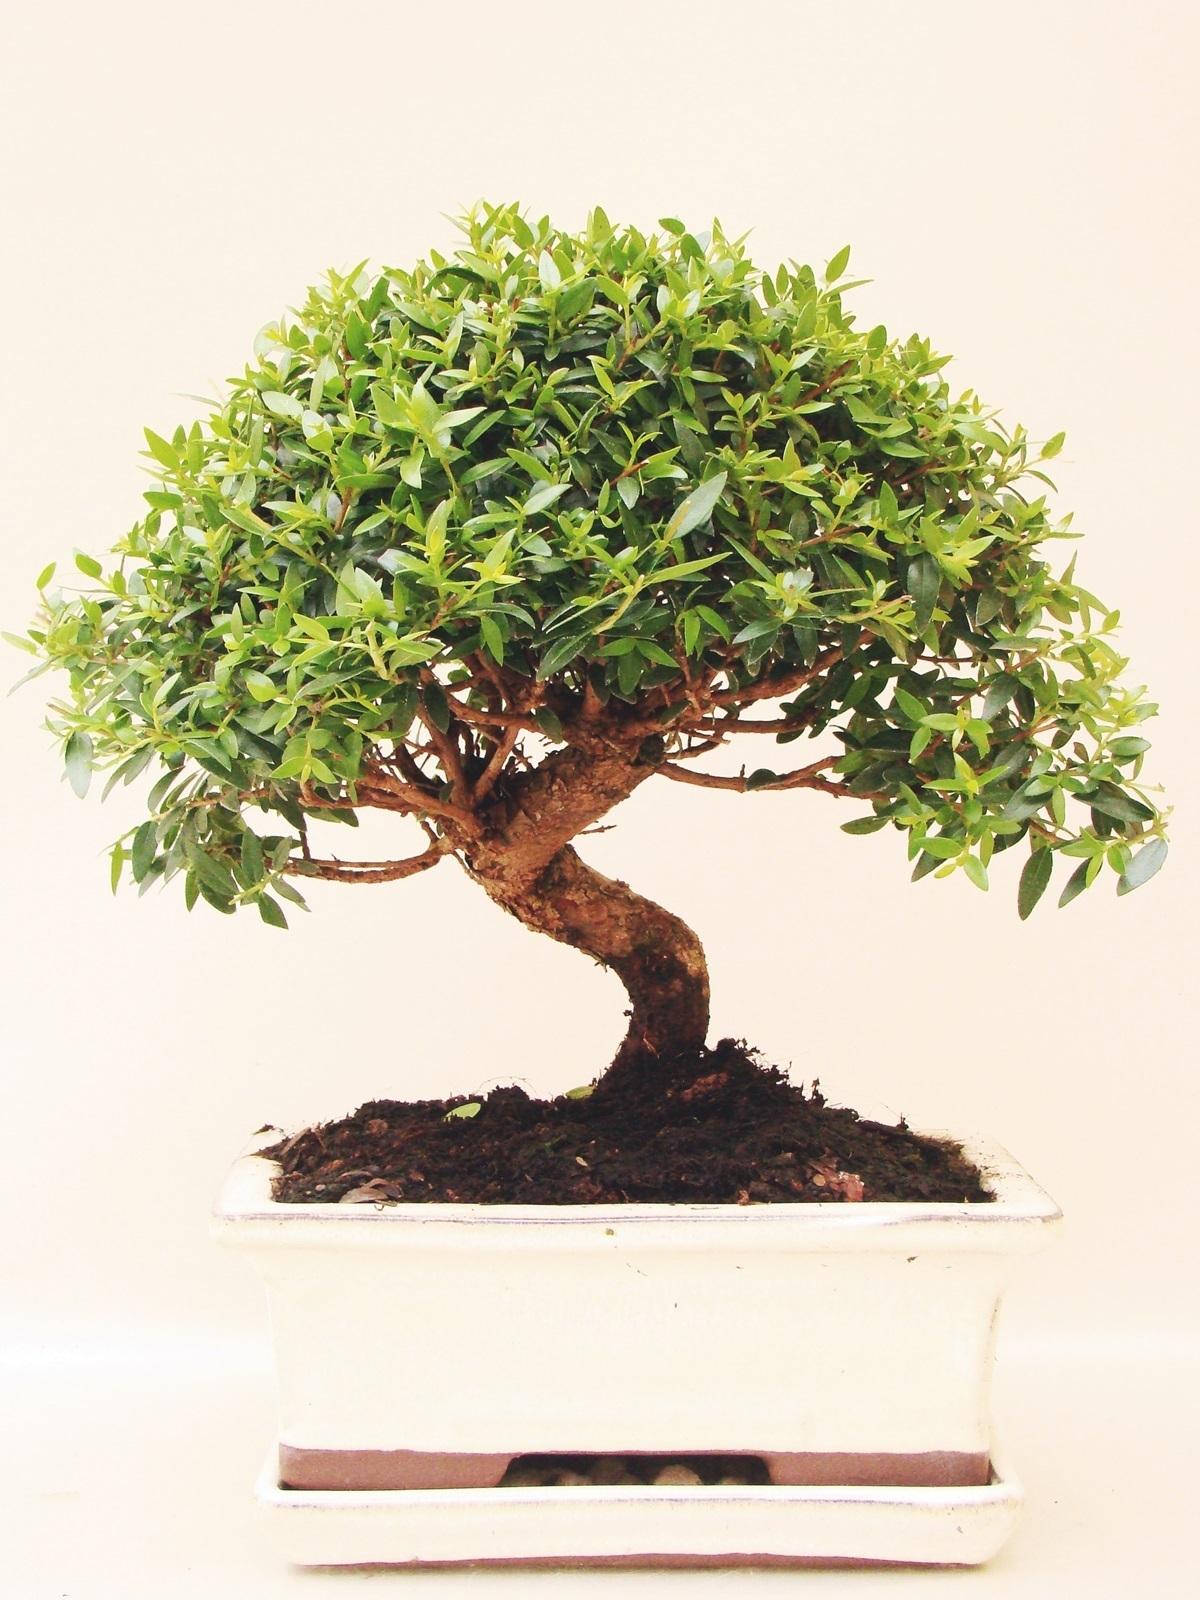 myrte brautmyrte my8 4 genki bonsai. Black Bedroom Furniture Sets. Home Design Ideas